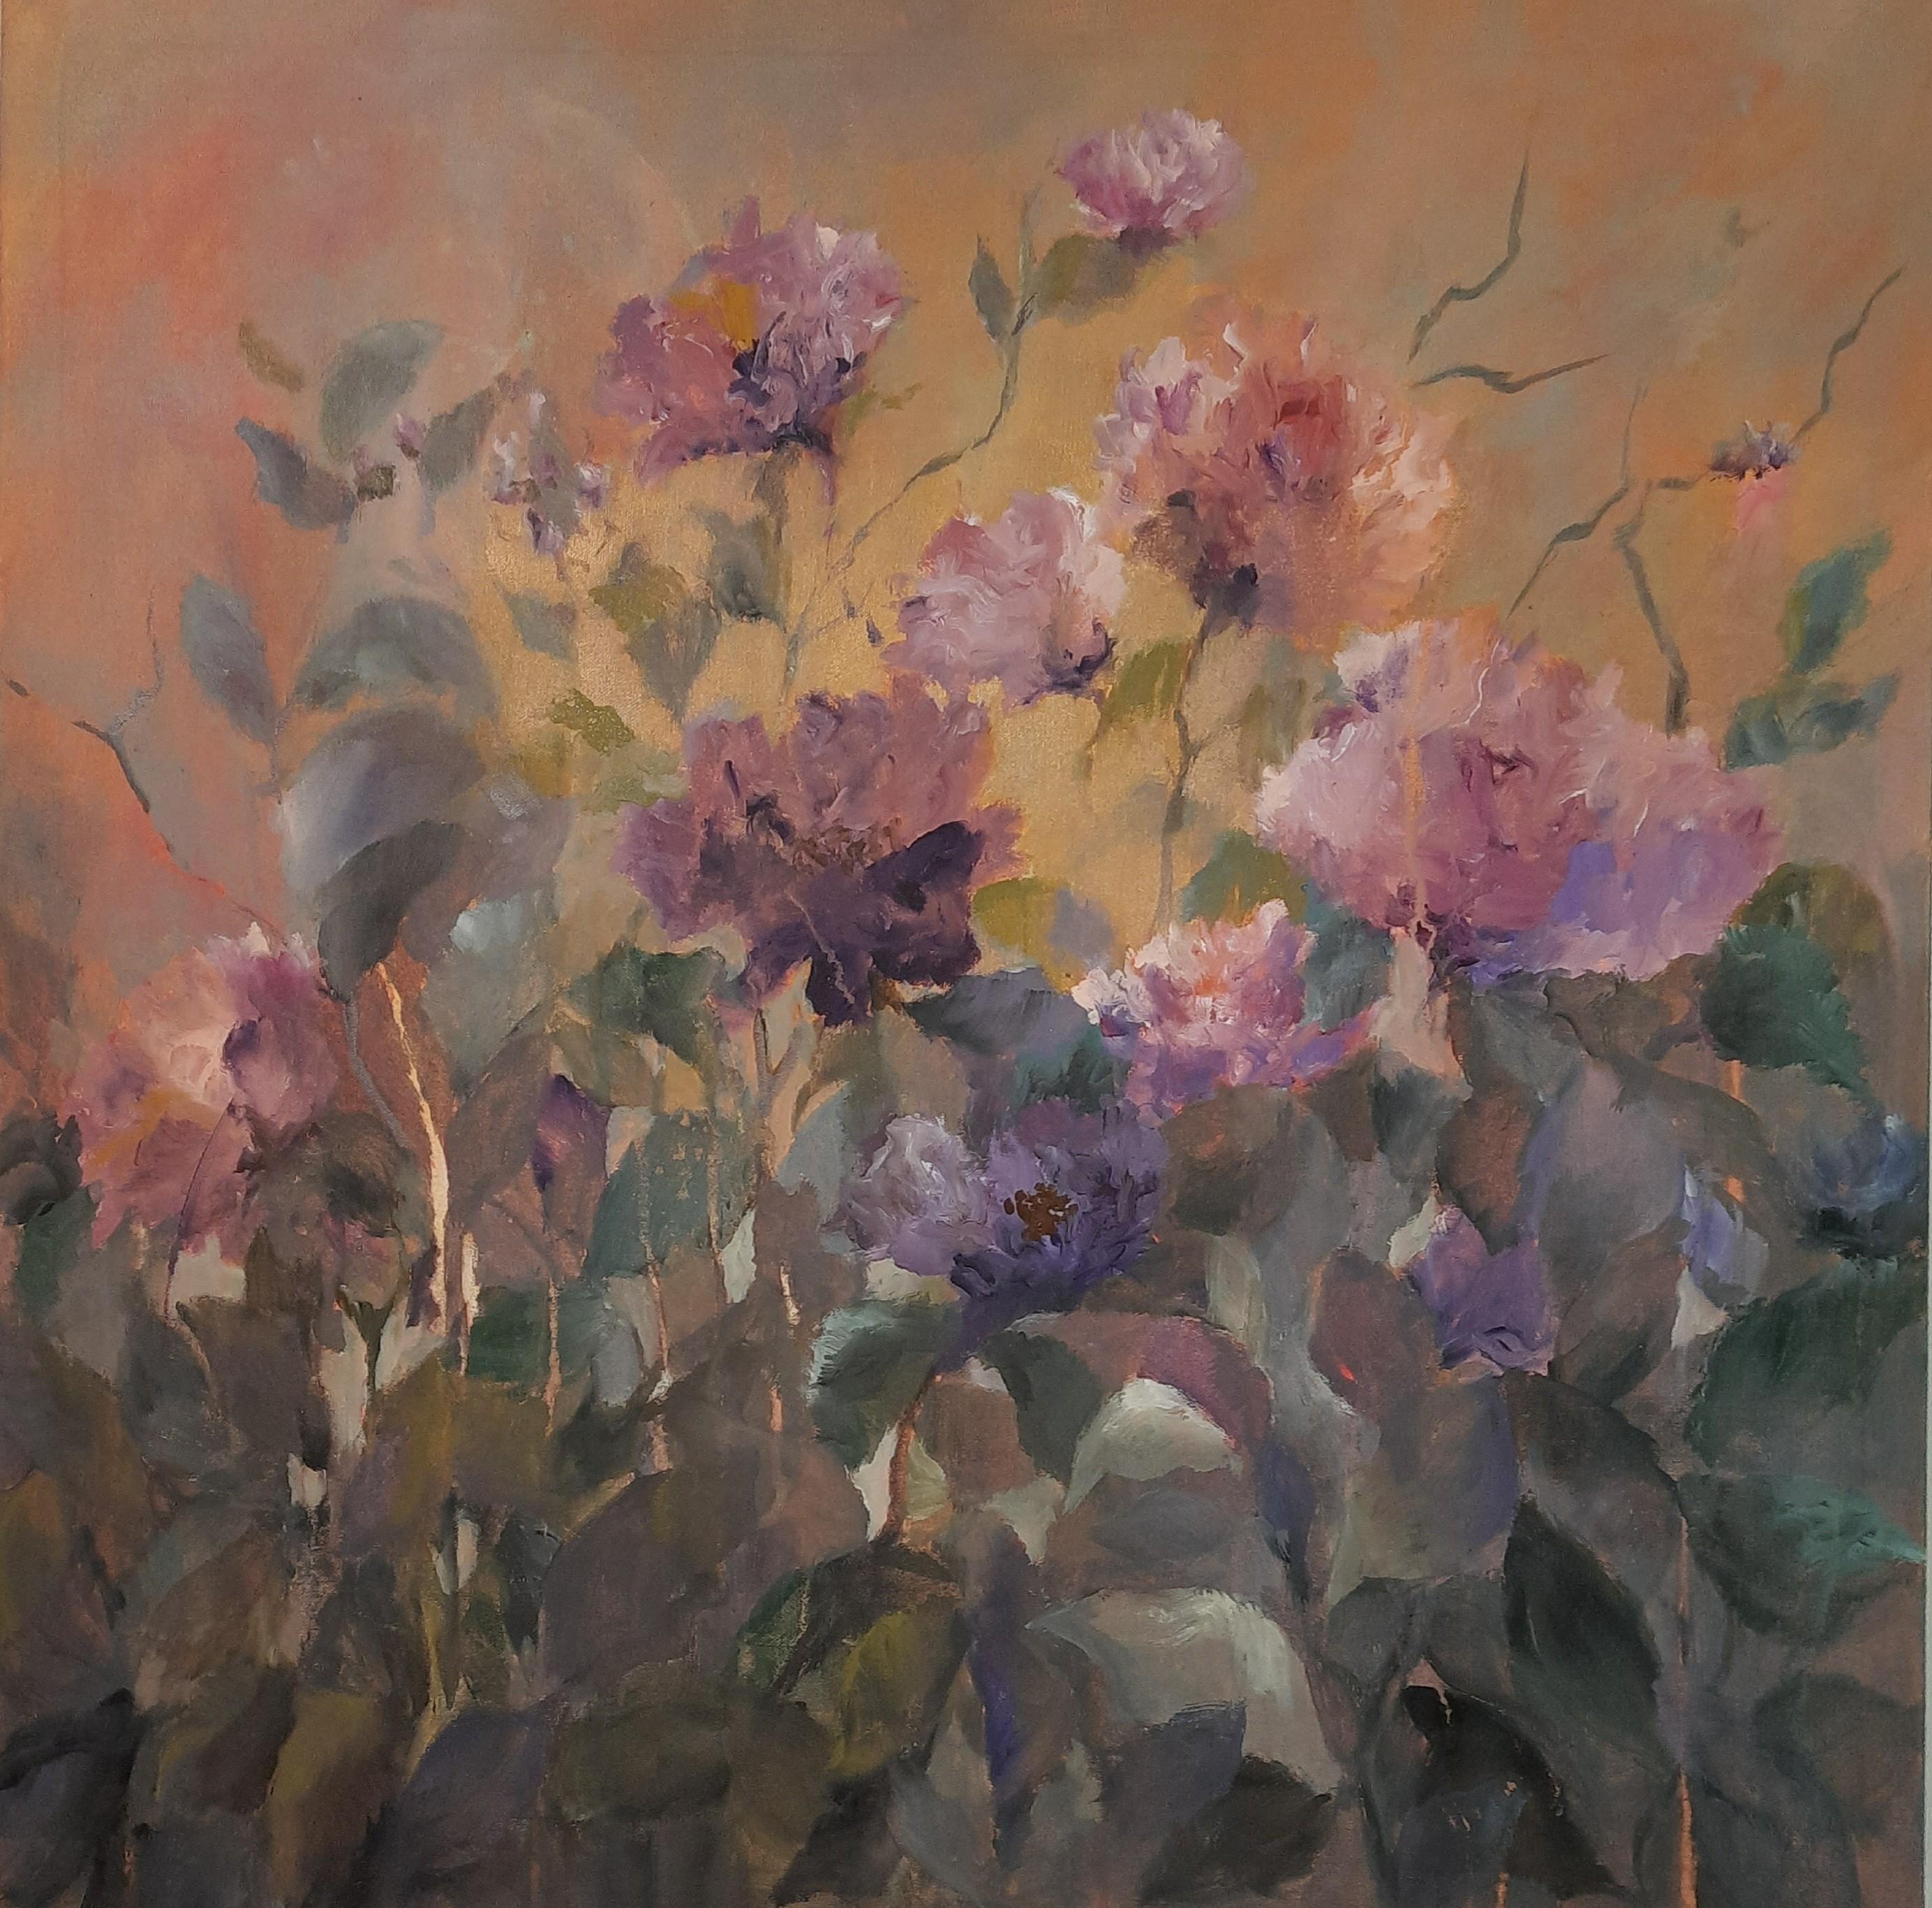 Rise and shine by Jean wijesekera